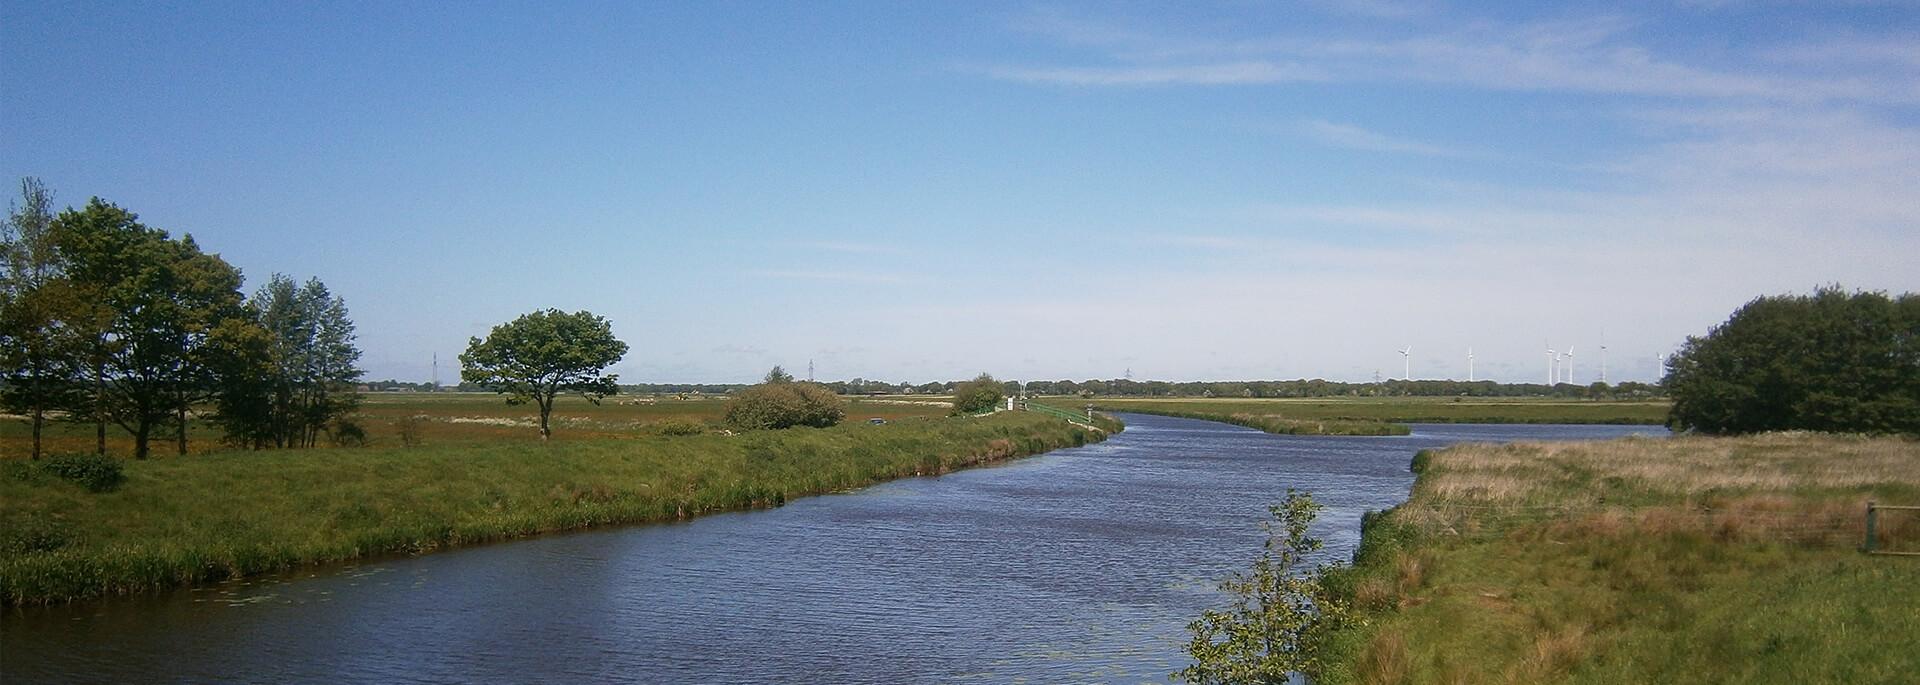 Samtgemeinde-Hesel-Slider-Kanal